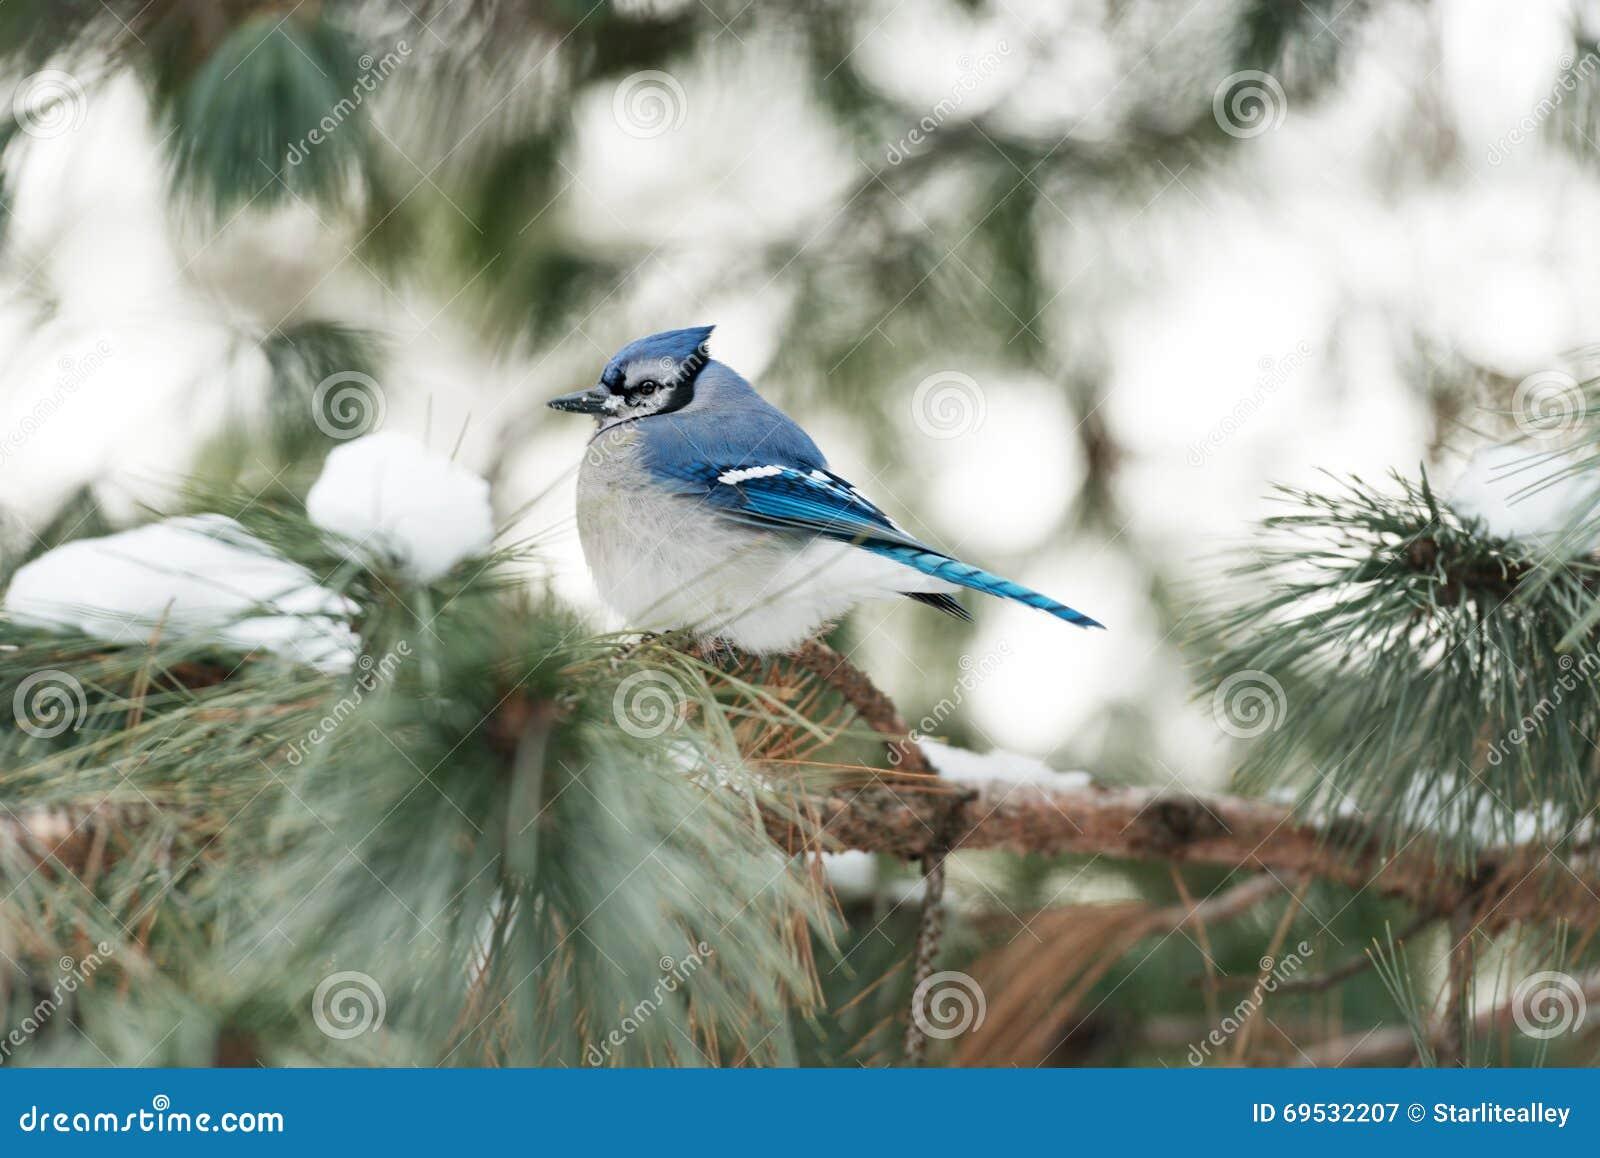 geai bleu en hiver image stock image du oiseau assez 69532207. Black Bedroom Furniture Sets. Home Design Ideas